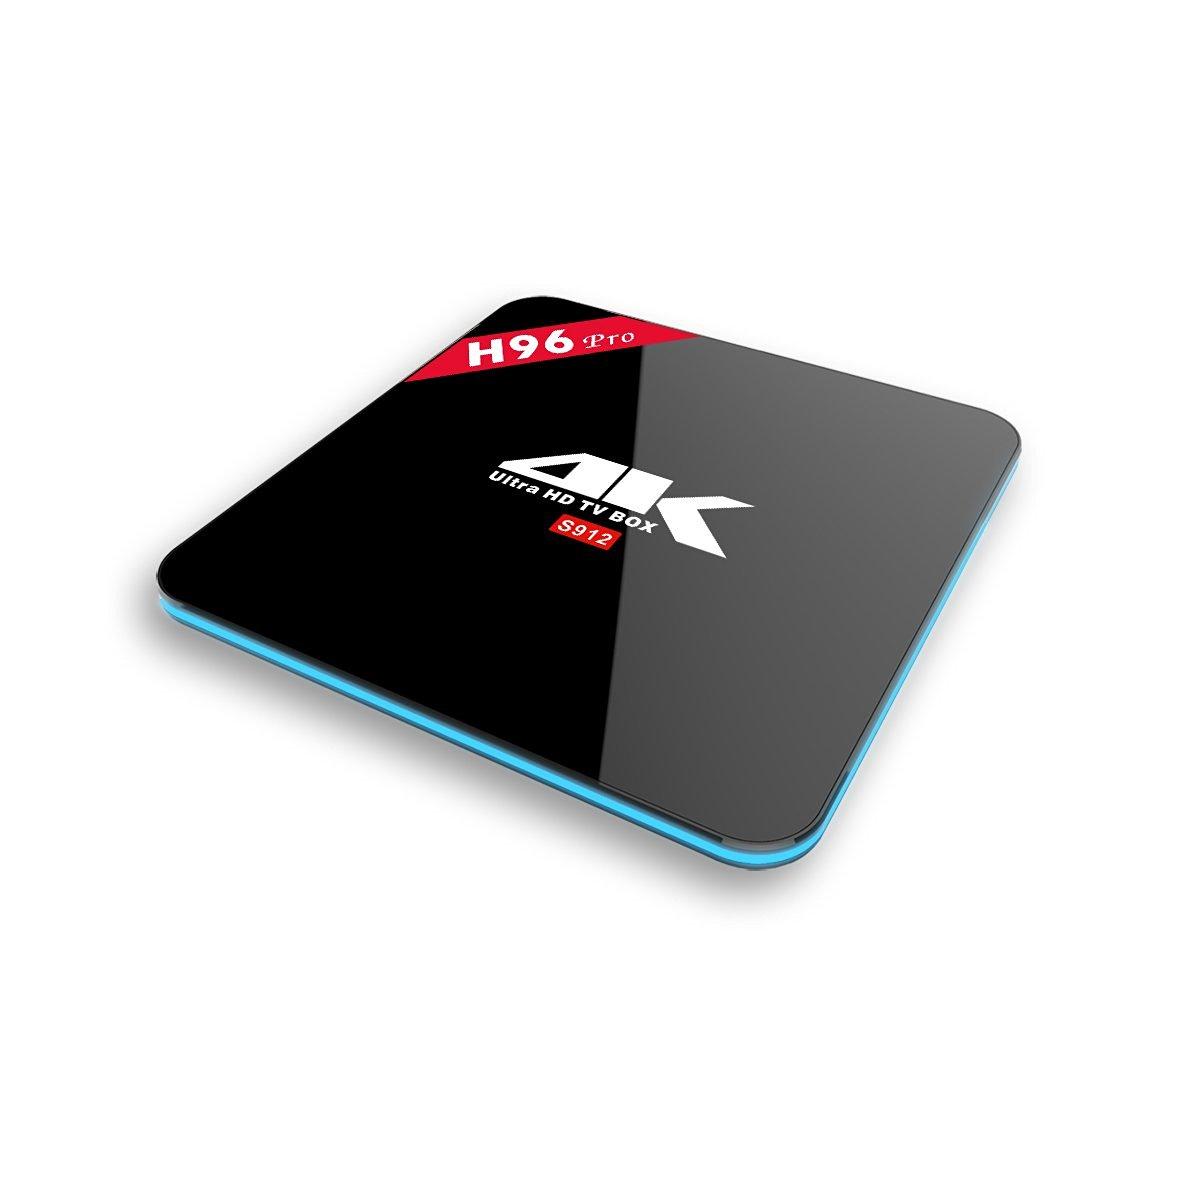 [2GB/16GB/4K] EstgoSZ H96 Pro 4K Android 6.0 TV BOX,S912 Octa core 4K Fully Loaded APP TV Box Streaming Player Bluetooth Enabled (2GB+16GB)